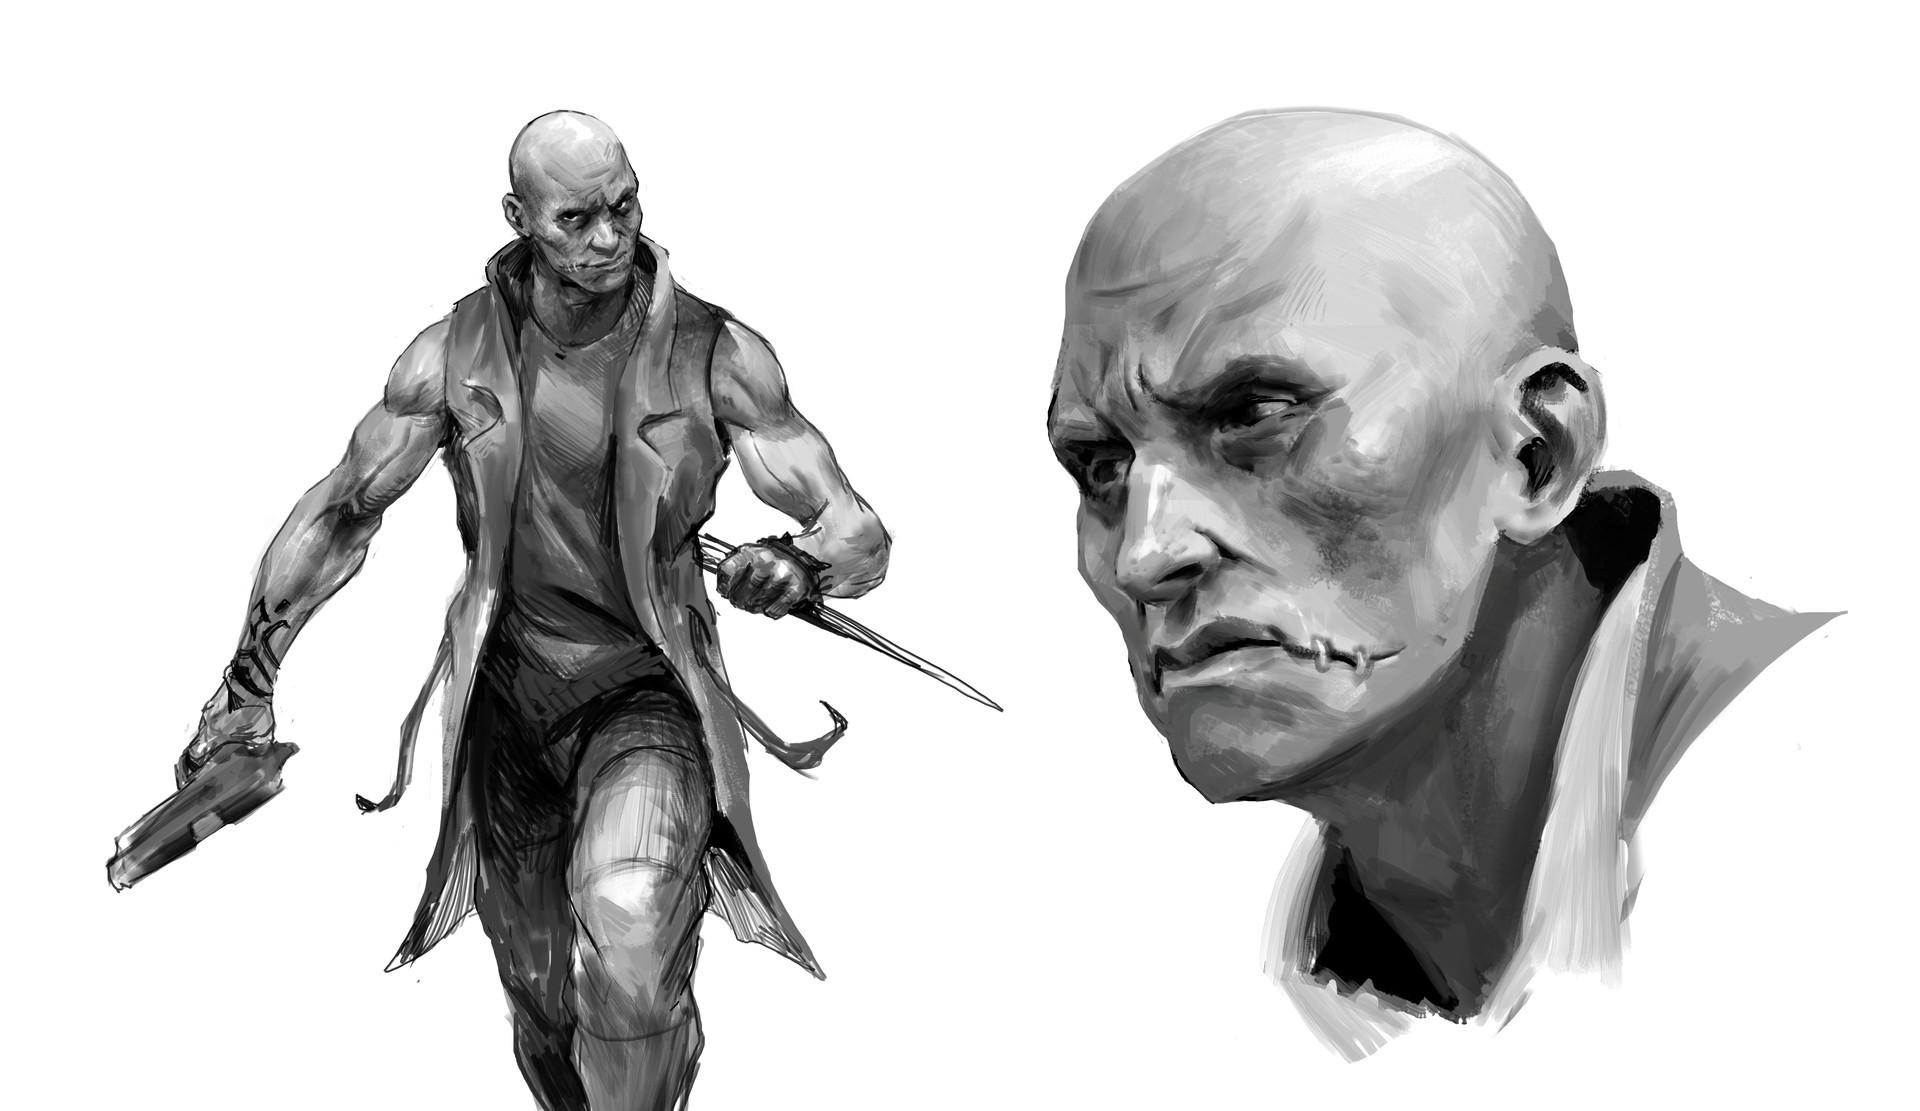 Miro petrov bald character